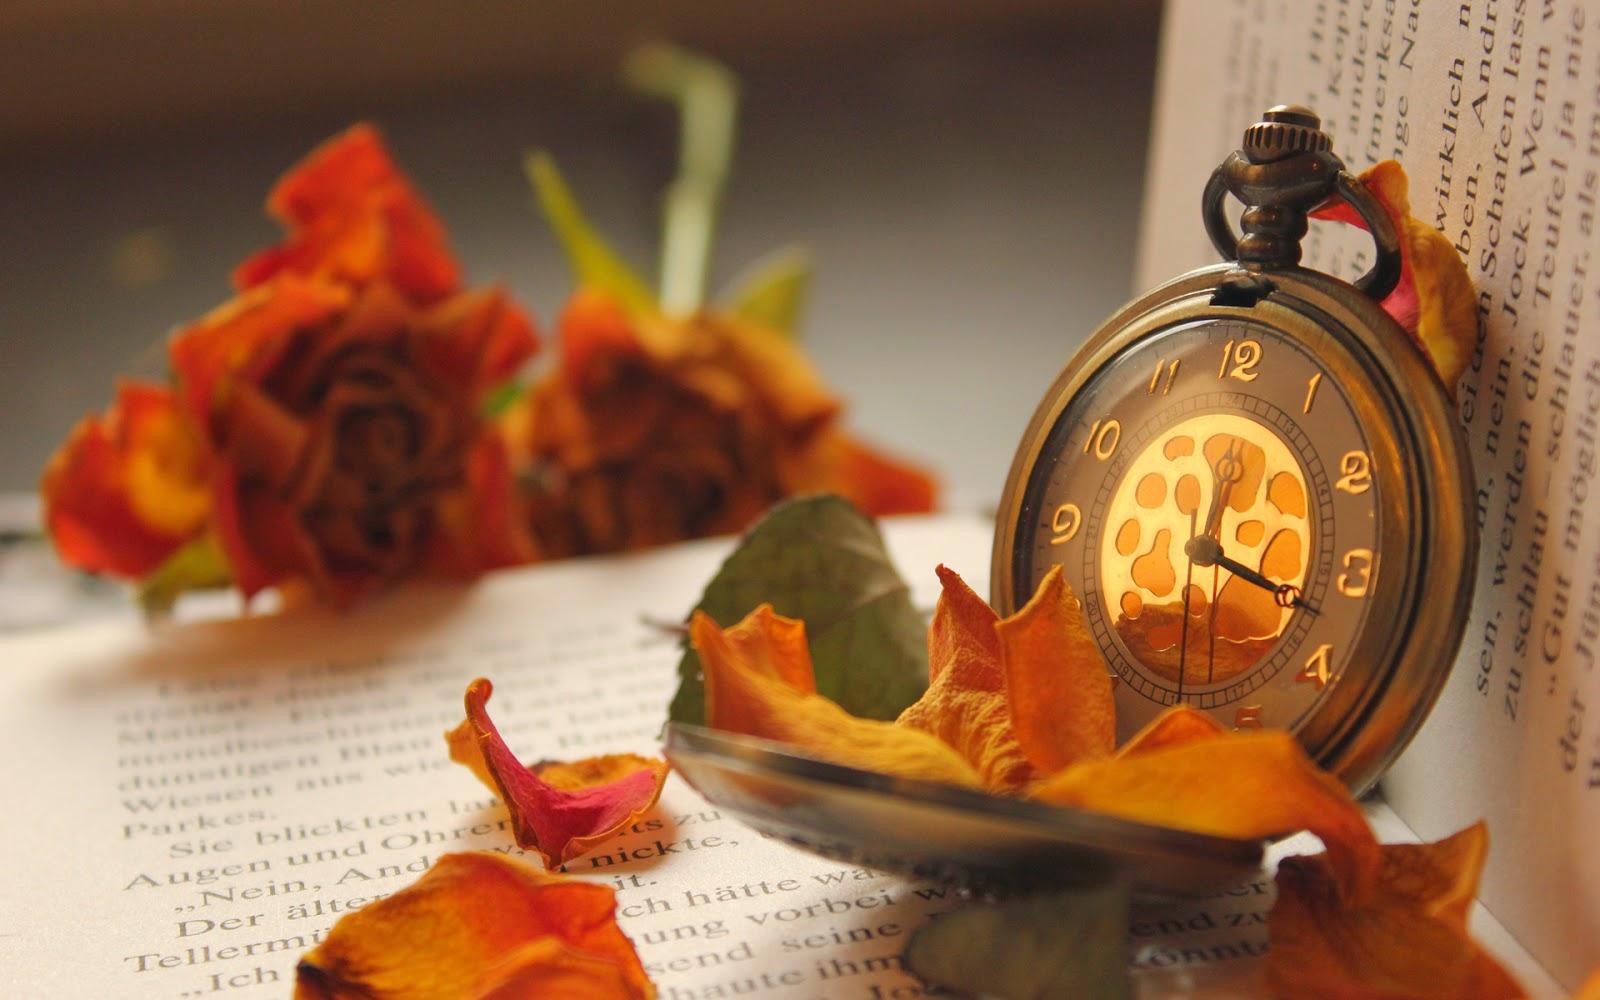 Beautiful Book Rose and Watch Wallpaper